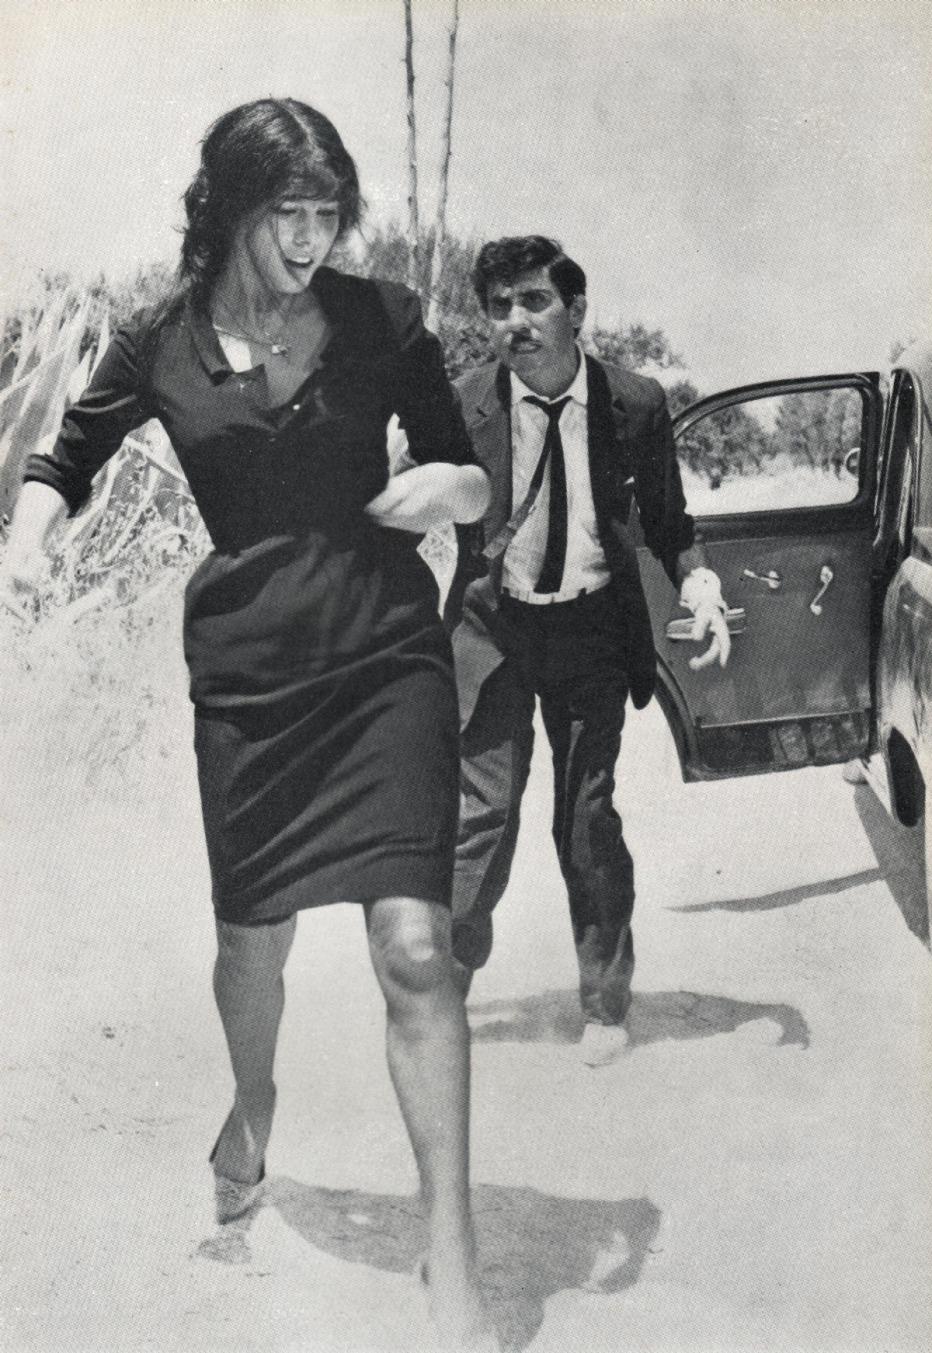 sedotta-e-abbandonata-1964-pietro-germi-30.jpg